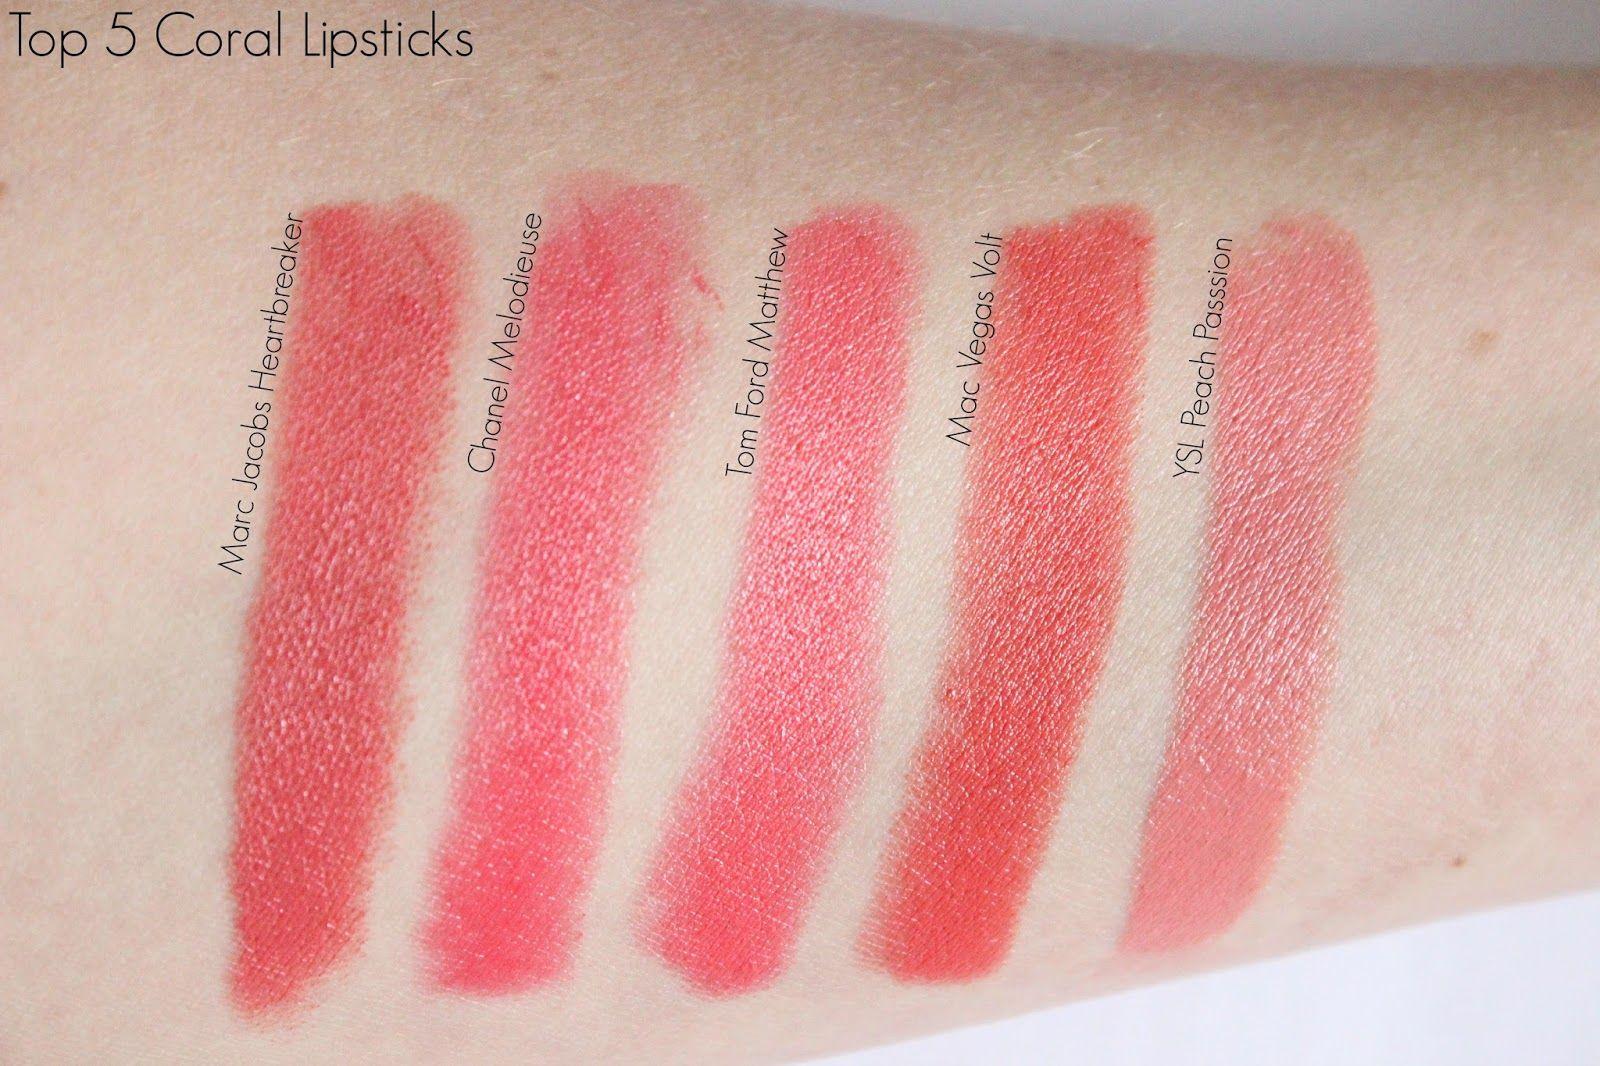 Top 5 Coral Lipstick Ysl Beauty Lipstick